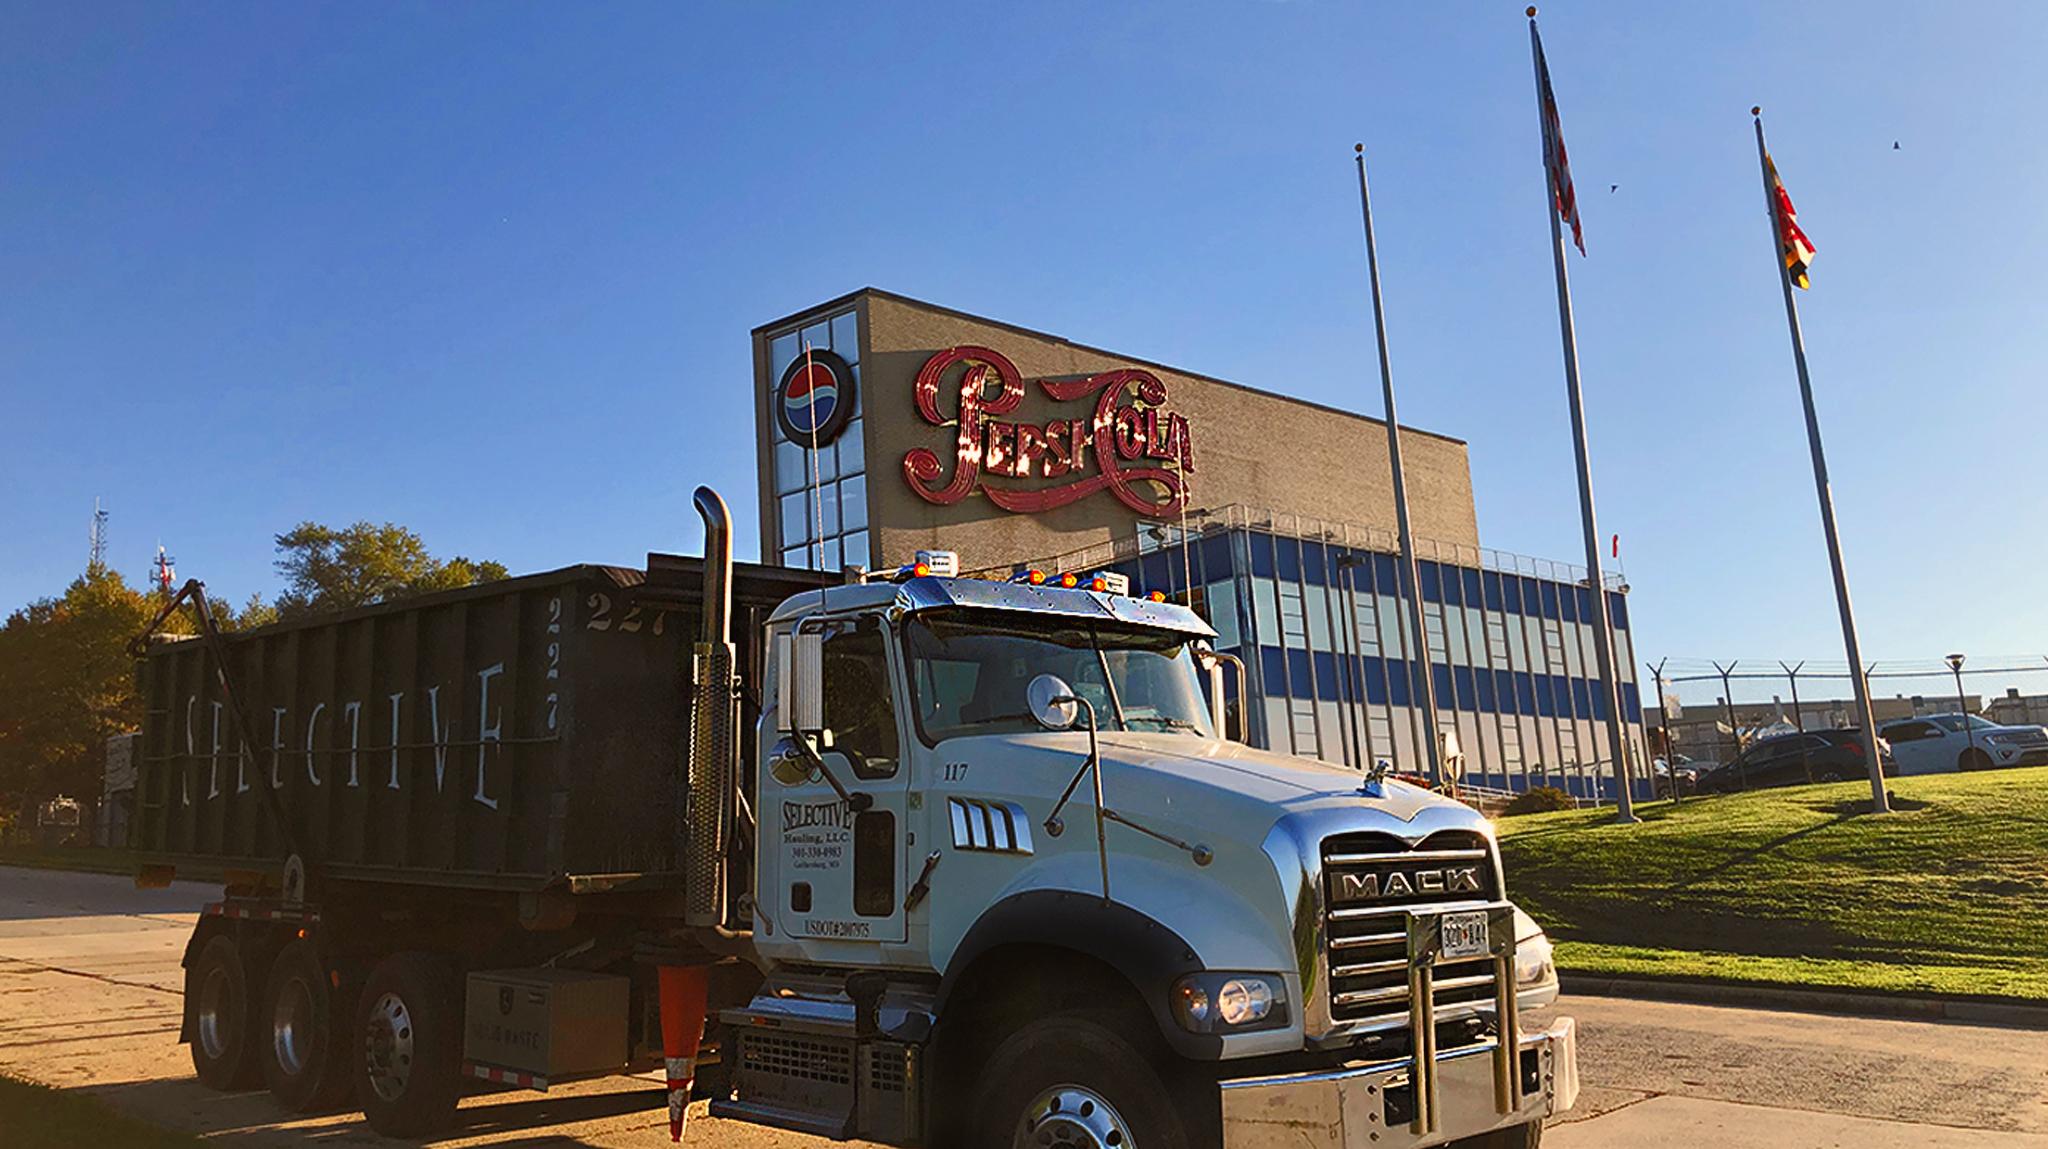 Roll off dumpster rental Virginia - Dumpster Rental Virginia